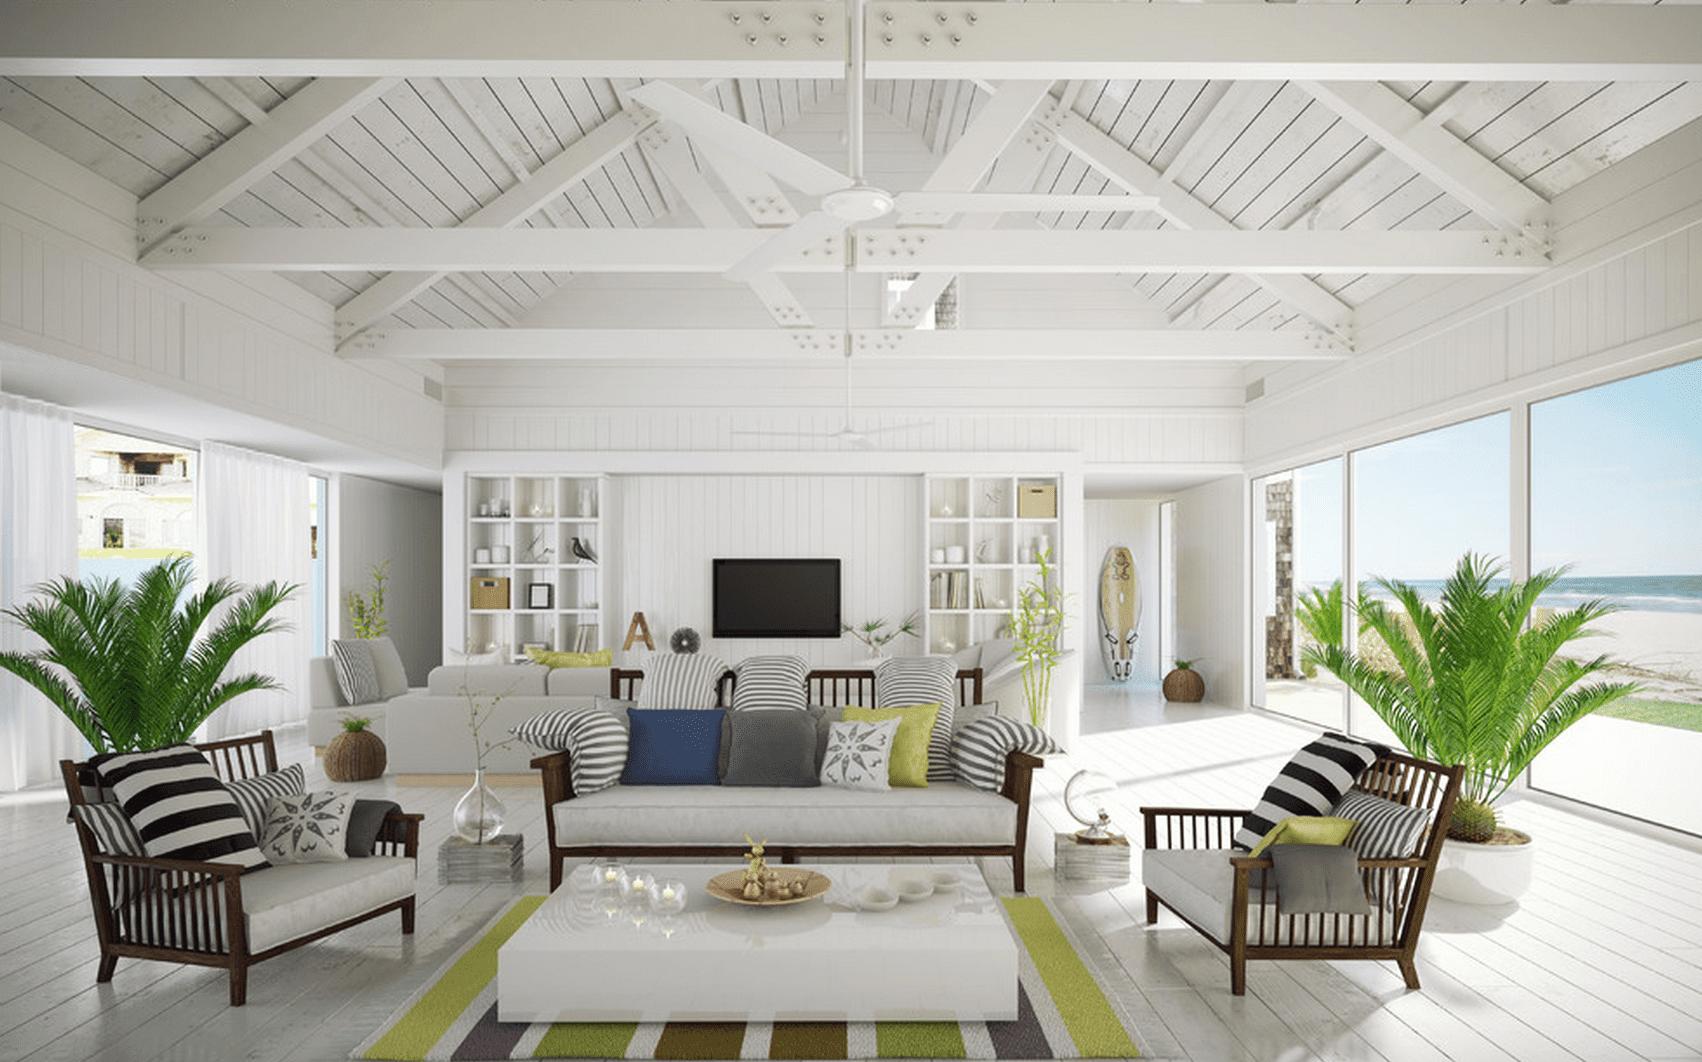 beach home interior design. Perfect Interior To Beach Home Interior Design